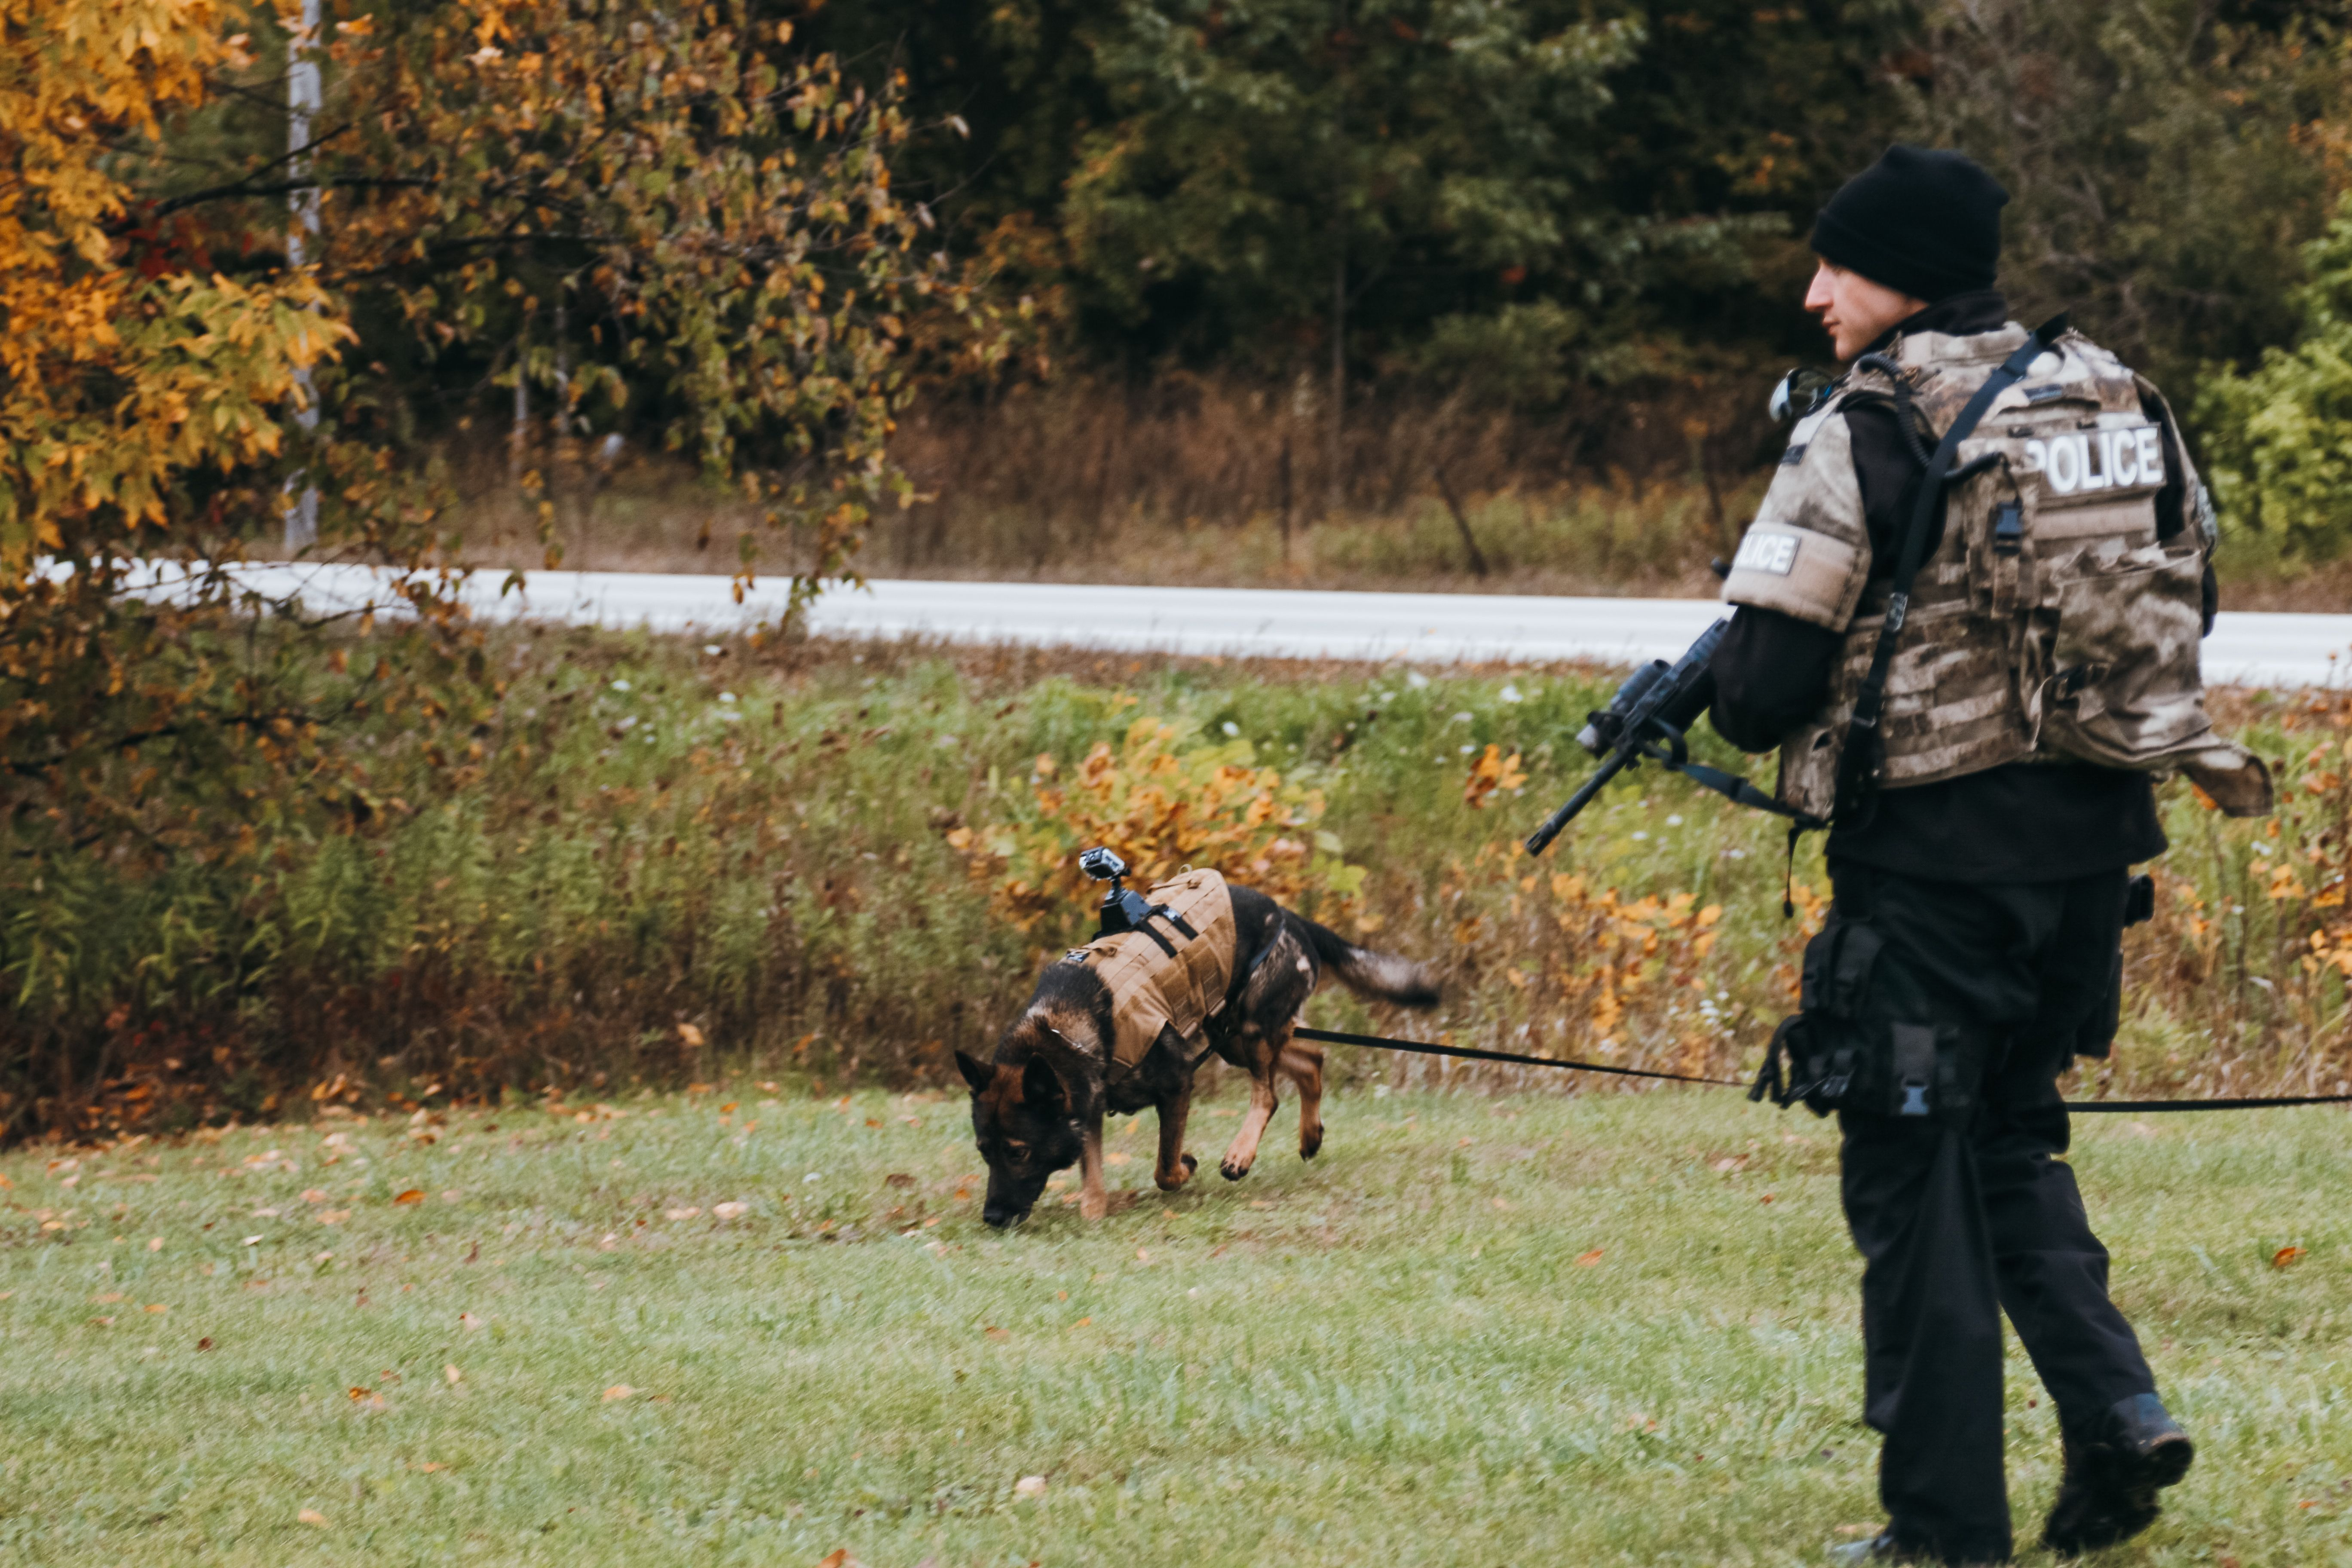 Training Police K9 Tracking Dogs Seminar With Kevin Sheldahl I Police K9 Puppy Dog Seminar Dogtraining Tracking Dogs Police K9 Dogs